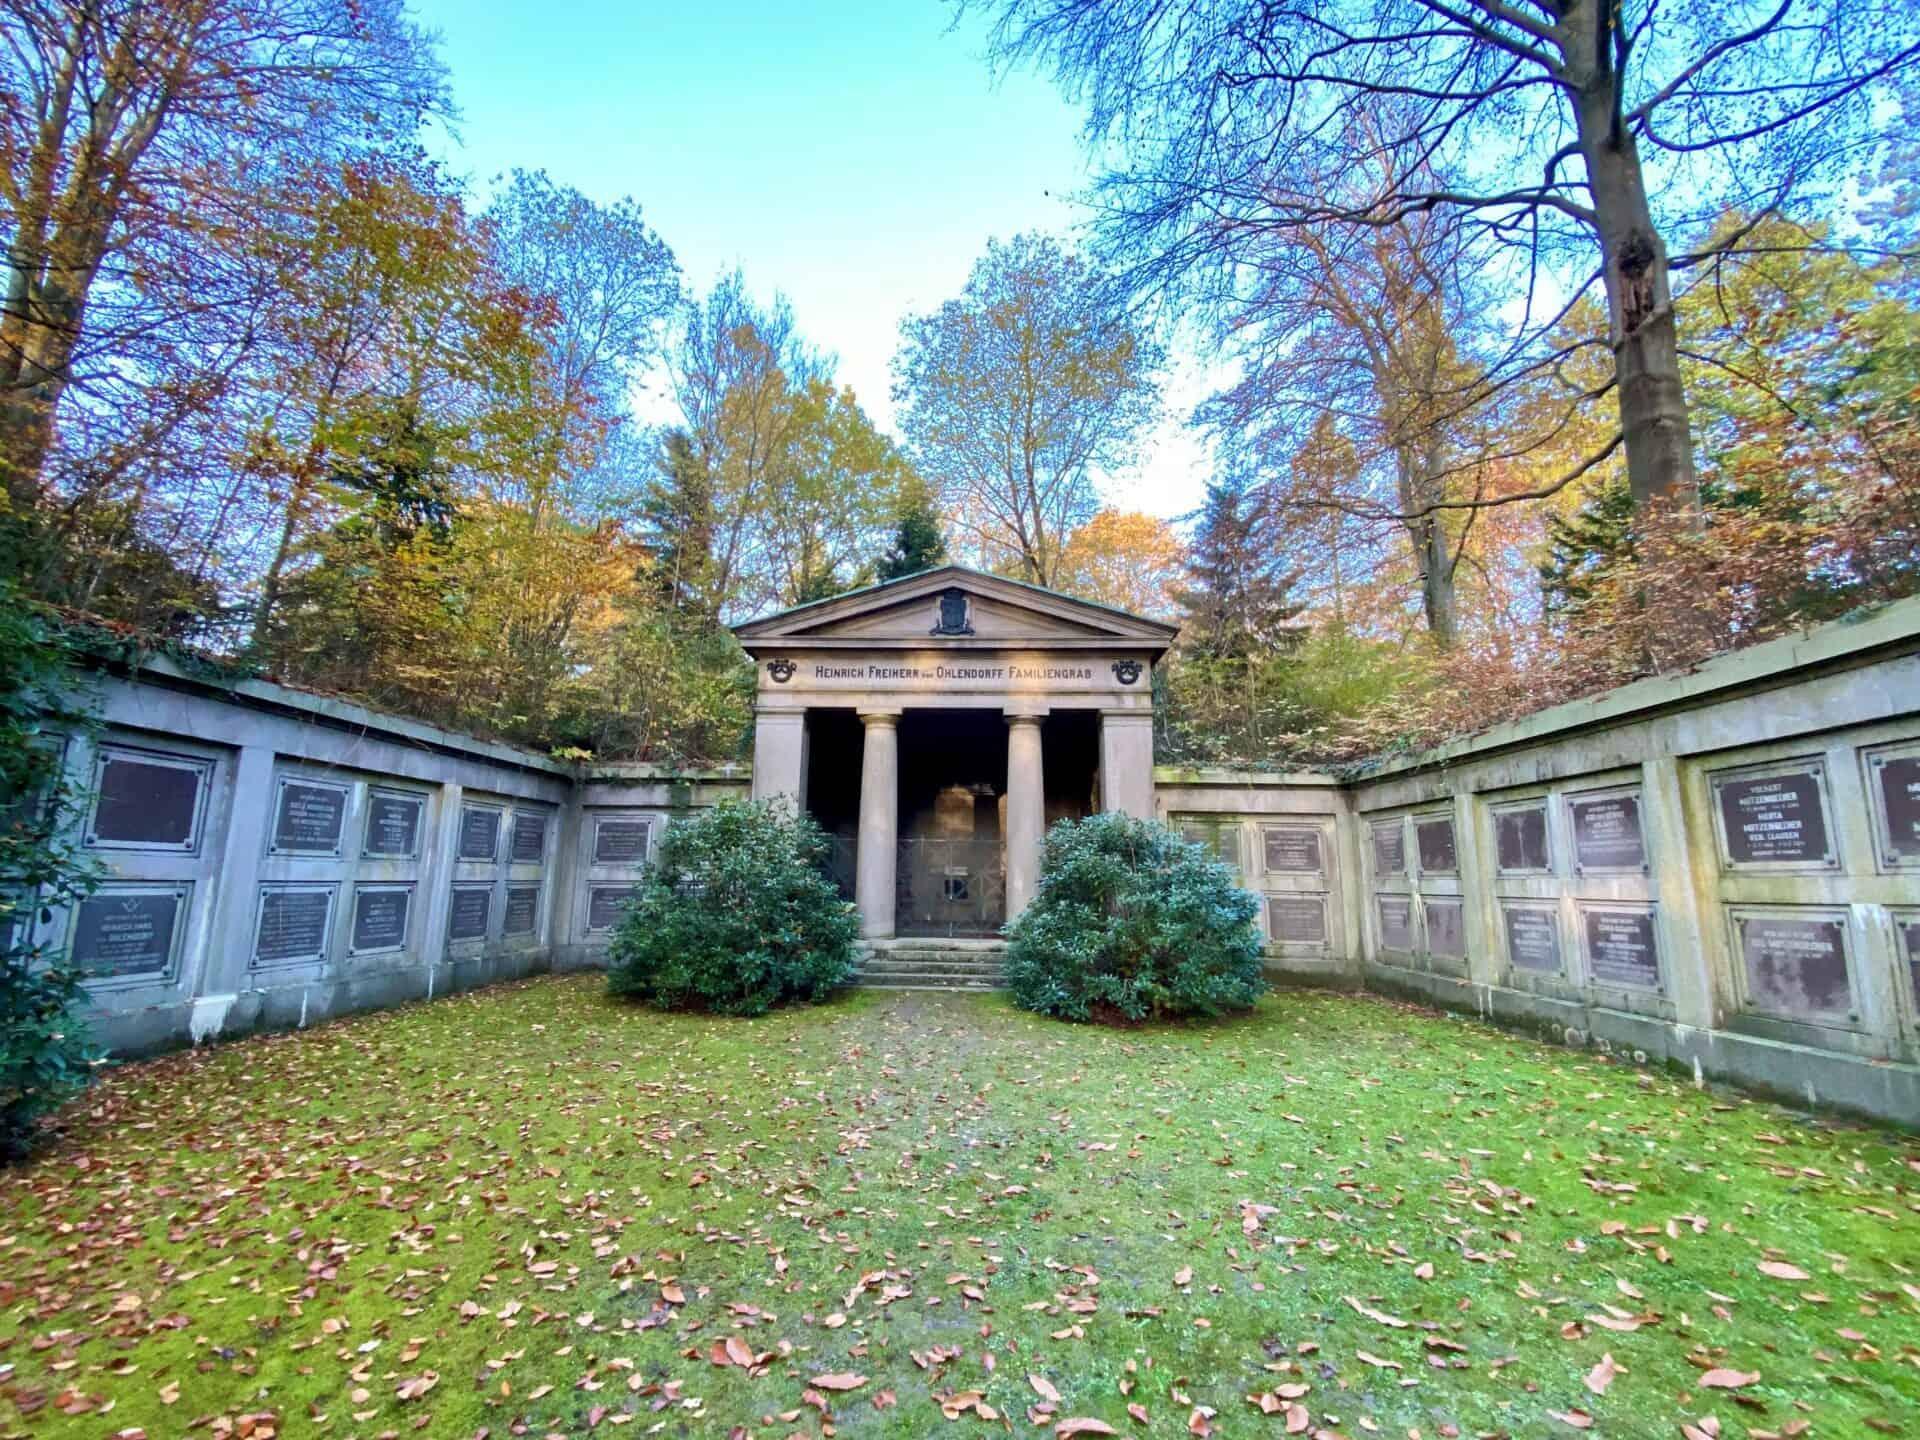 Führung Hamburg: Ohlsdorfer Friedhof - Ohlendorf Mausoleum